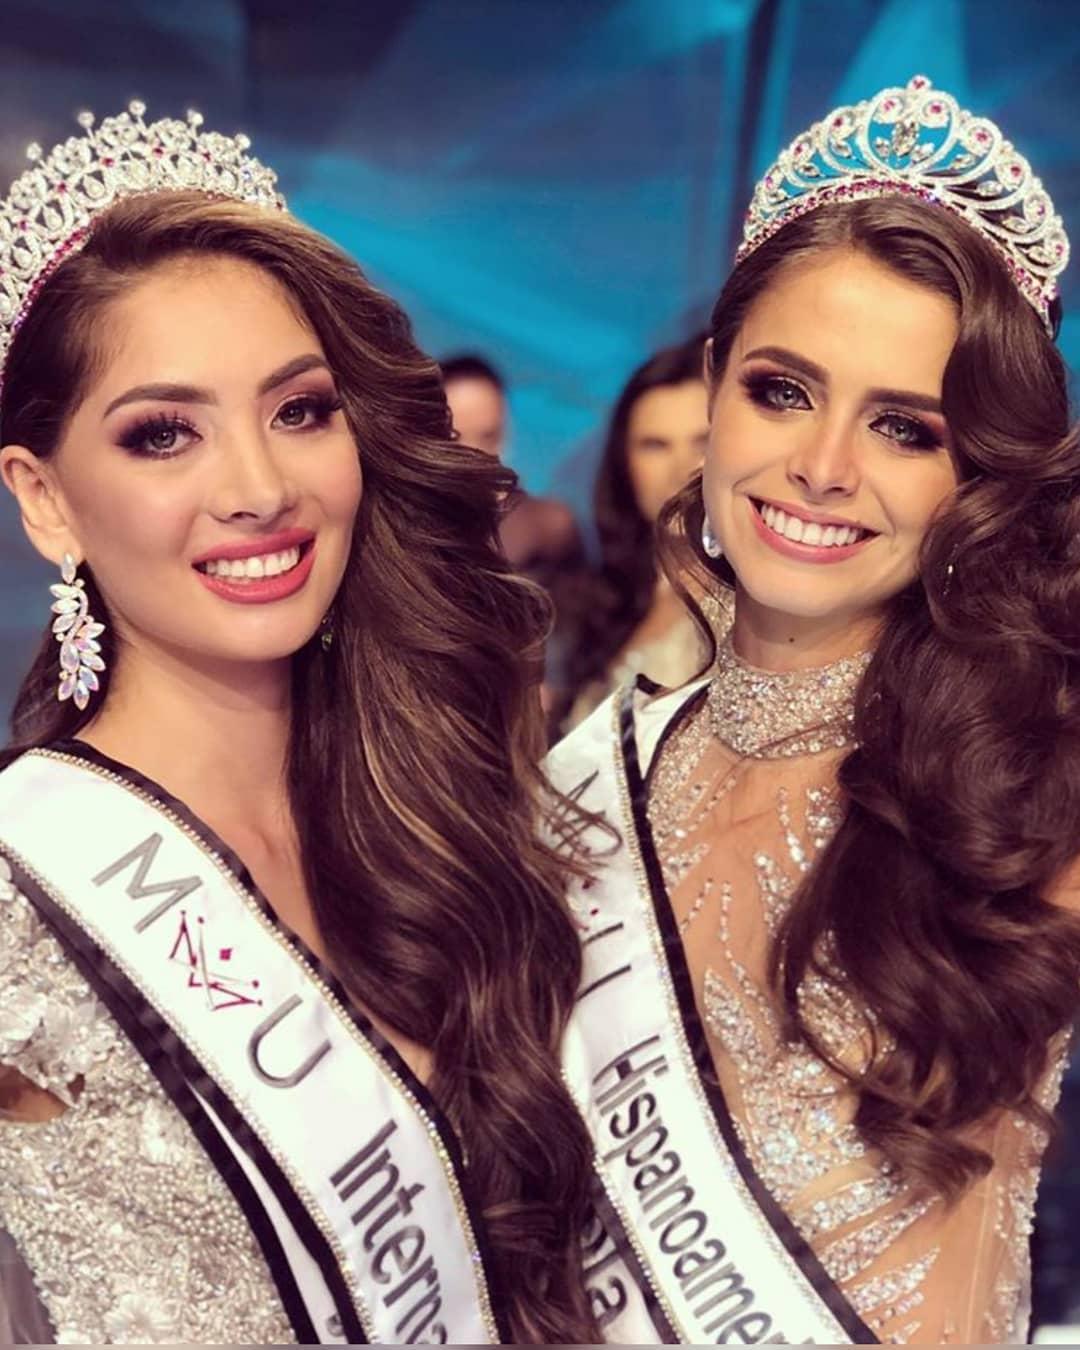 jalisco vence mexicana universal 2019. - Página 3 W9rth5r9